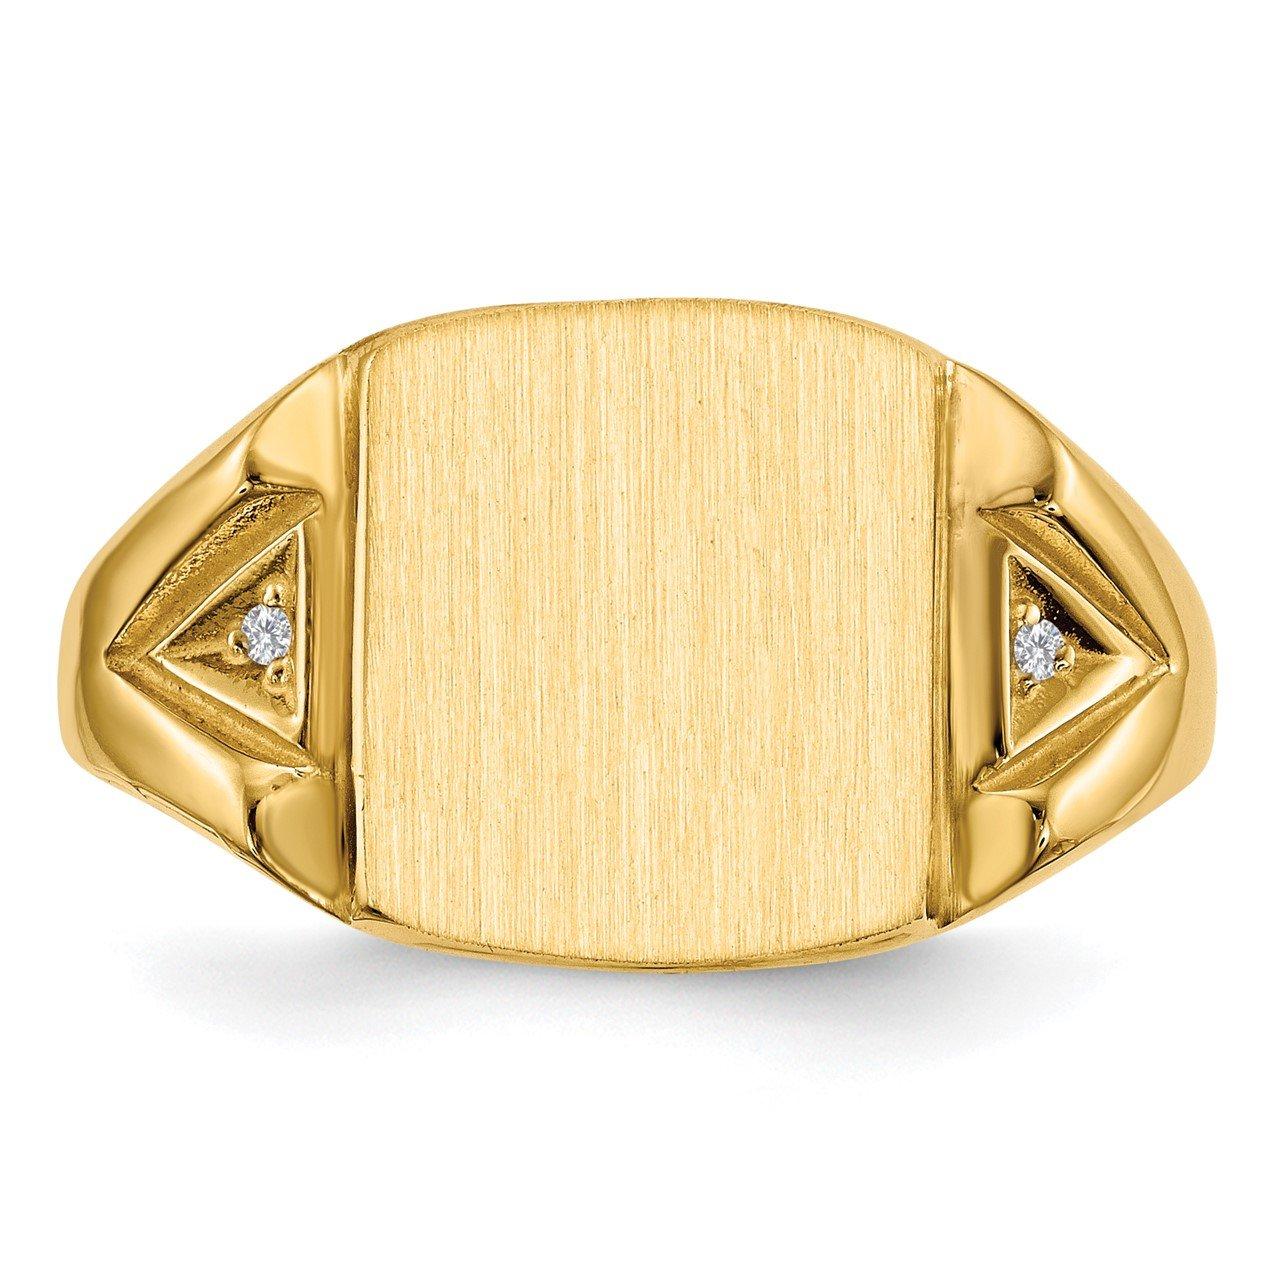 14k 12.0x11.0mm Open Back AA Diamond Men's Signet Ring-3